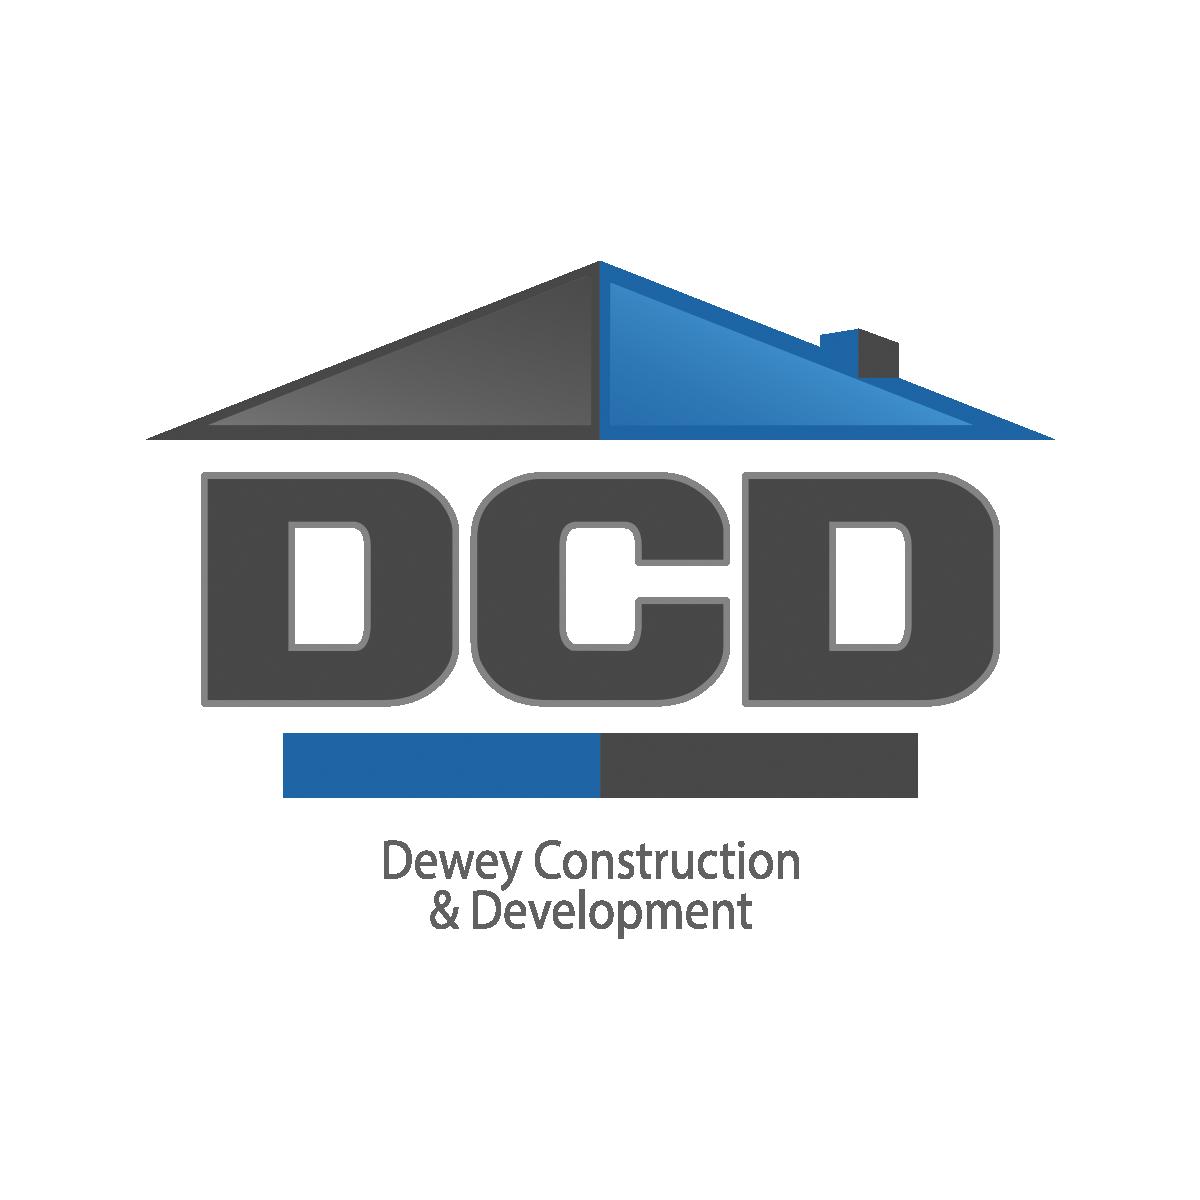 Dewey Construction